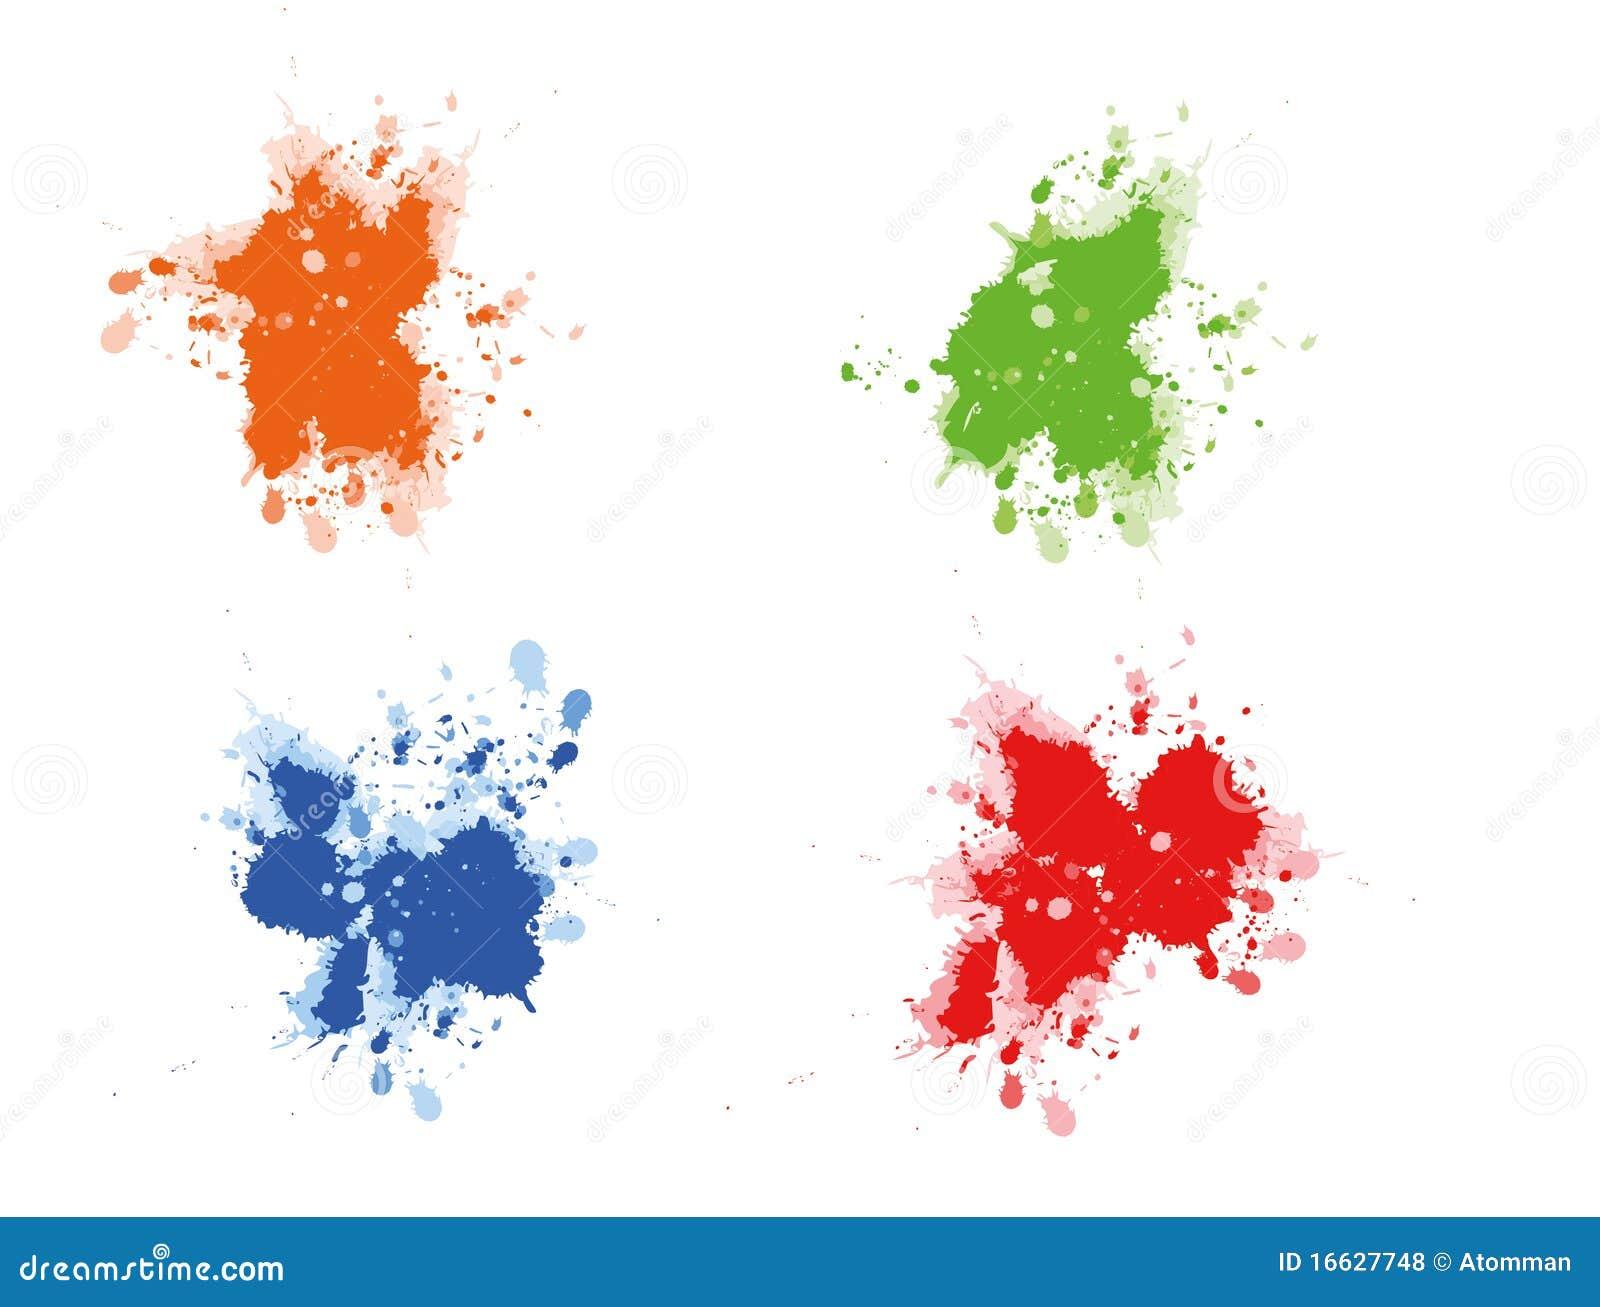 Multicolored paint splats